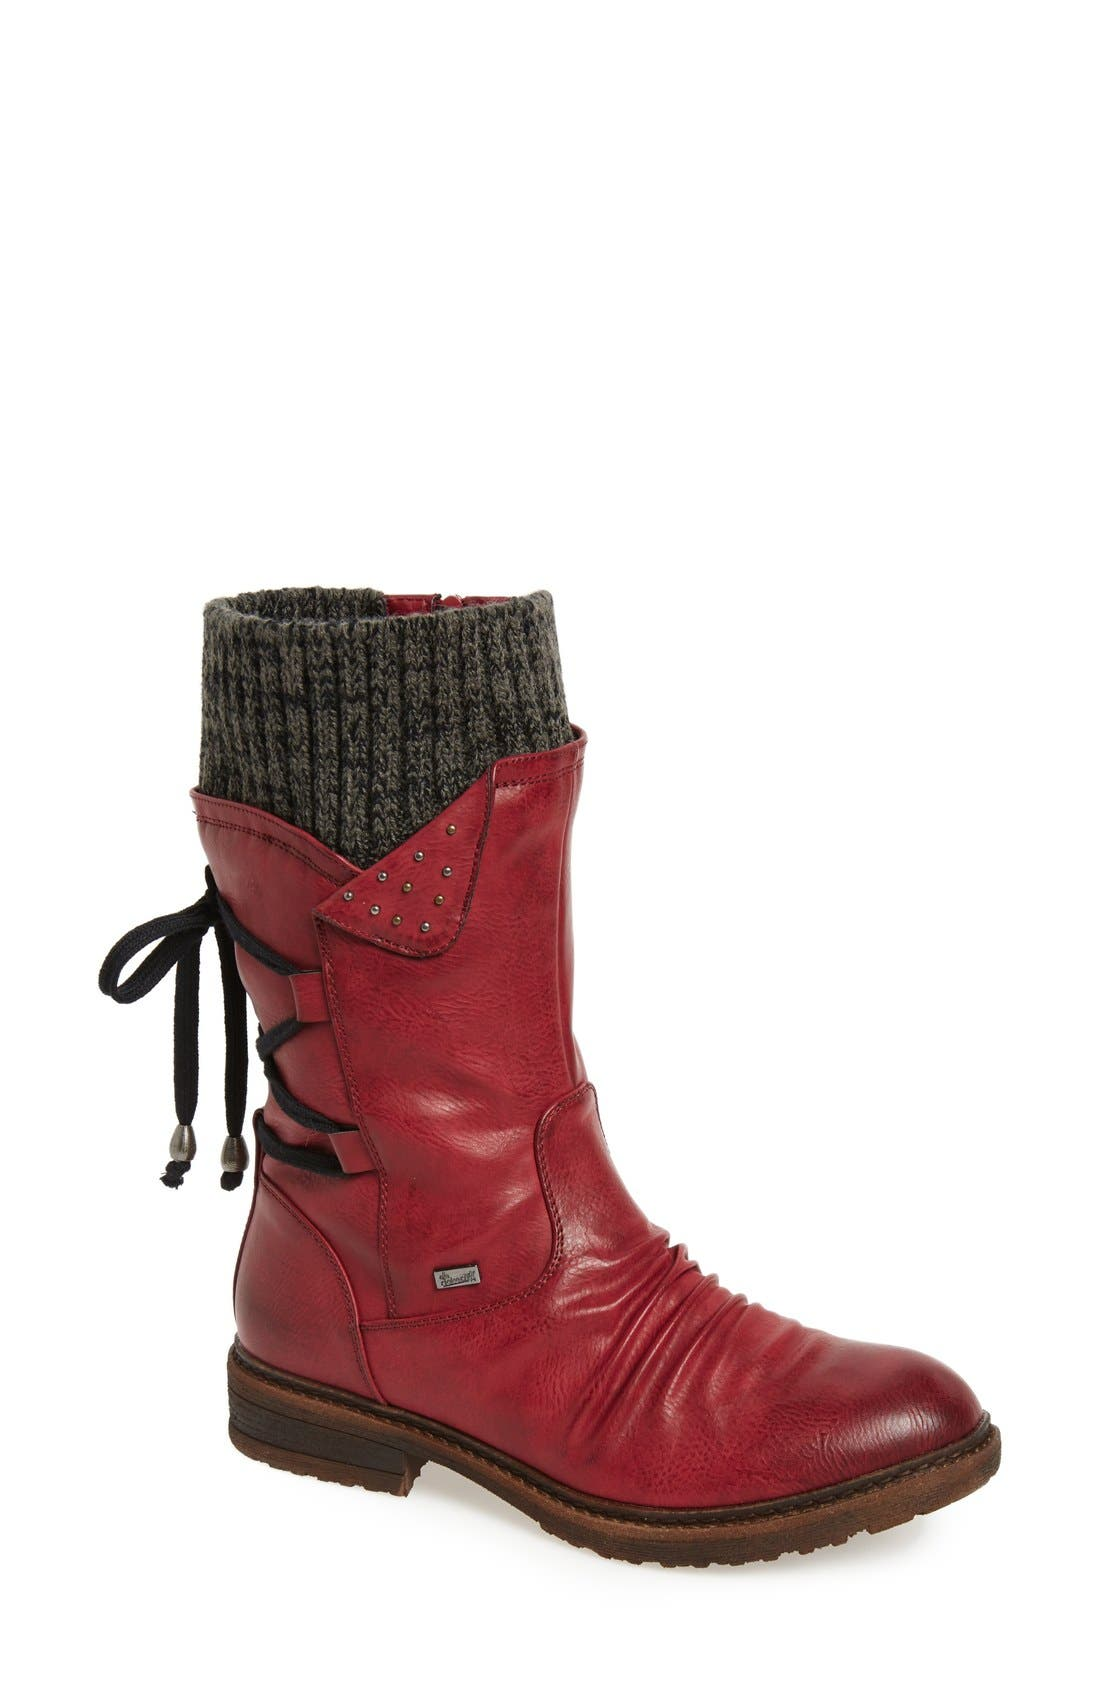 Main Image - Rieker Antistress Dominika 73 Water Resistant Boot (Women)